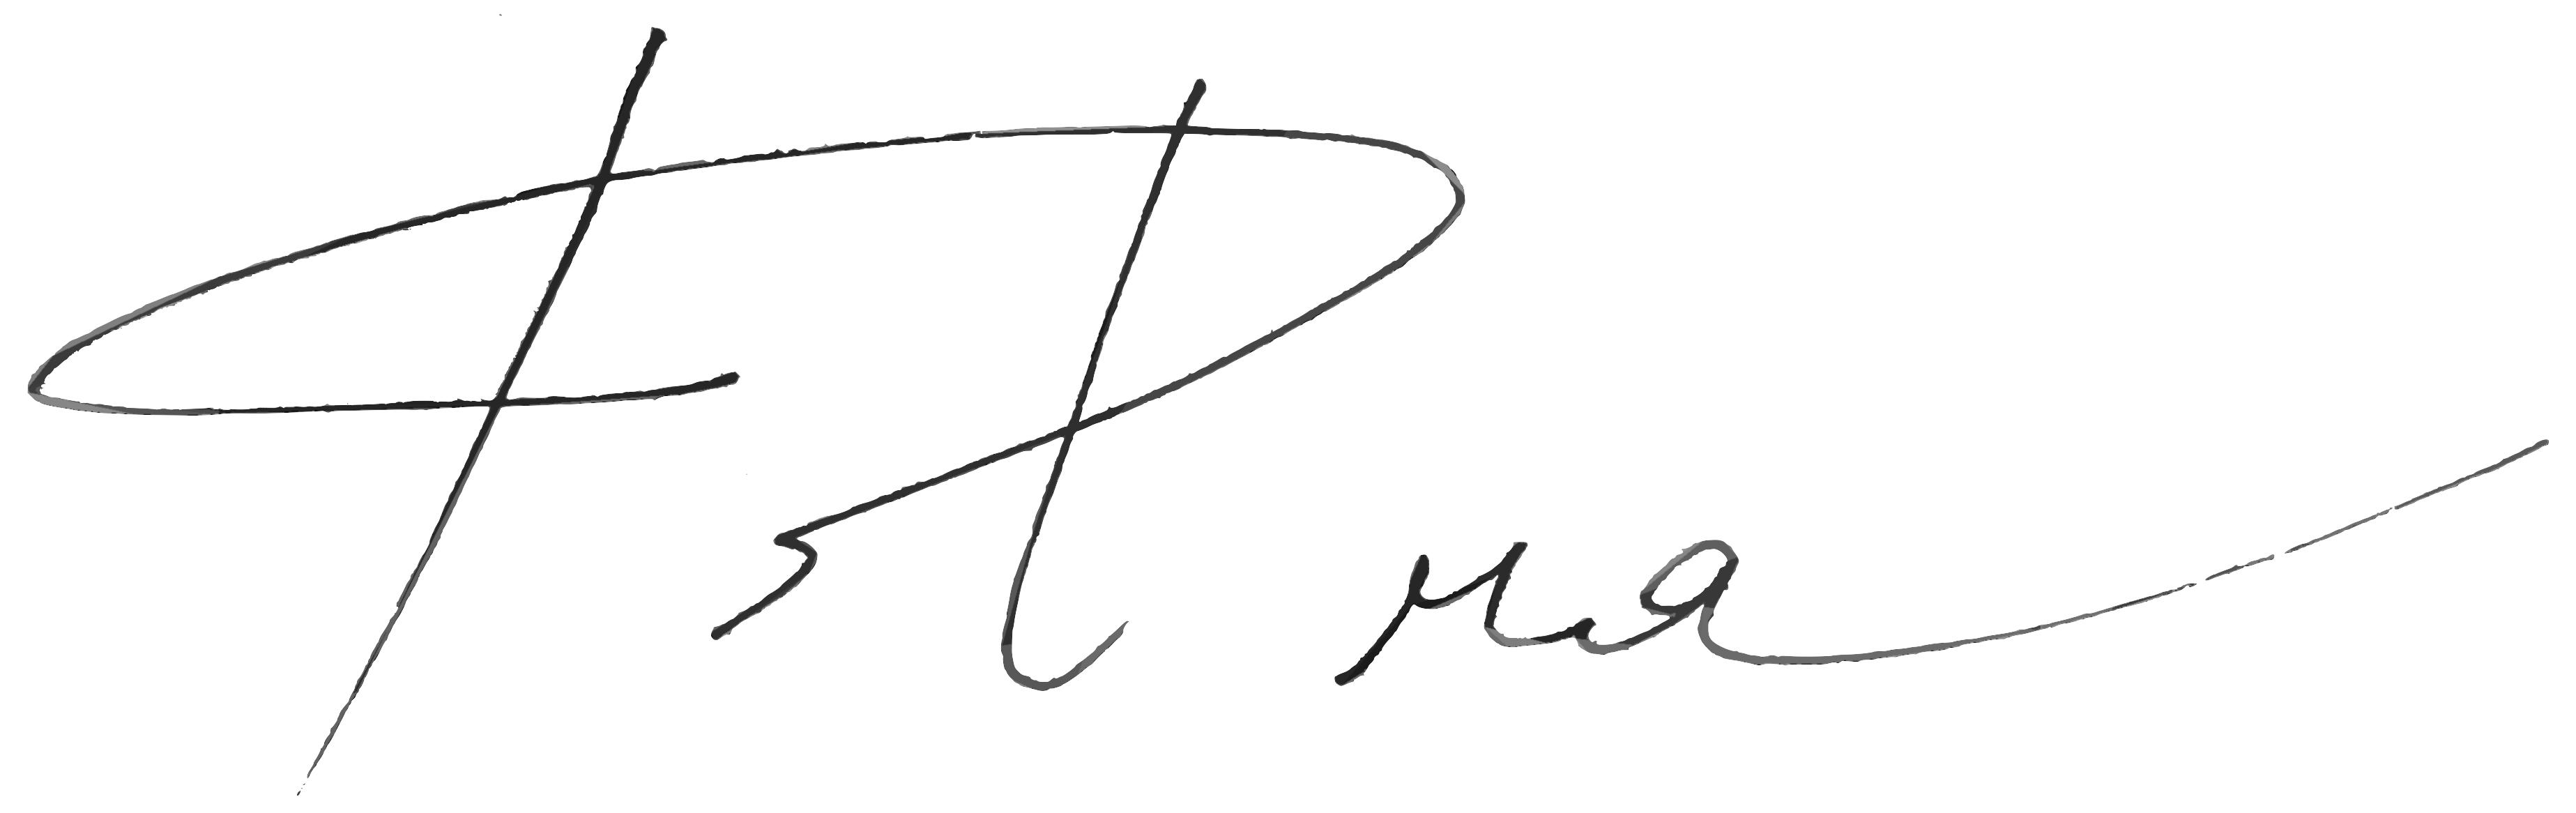 PETRA KNEZIC's Signature